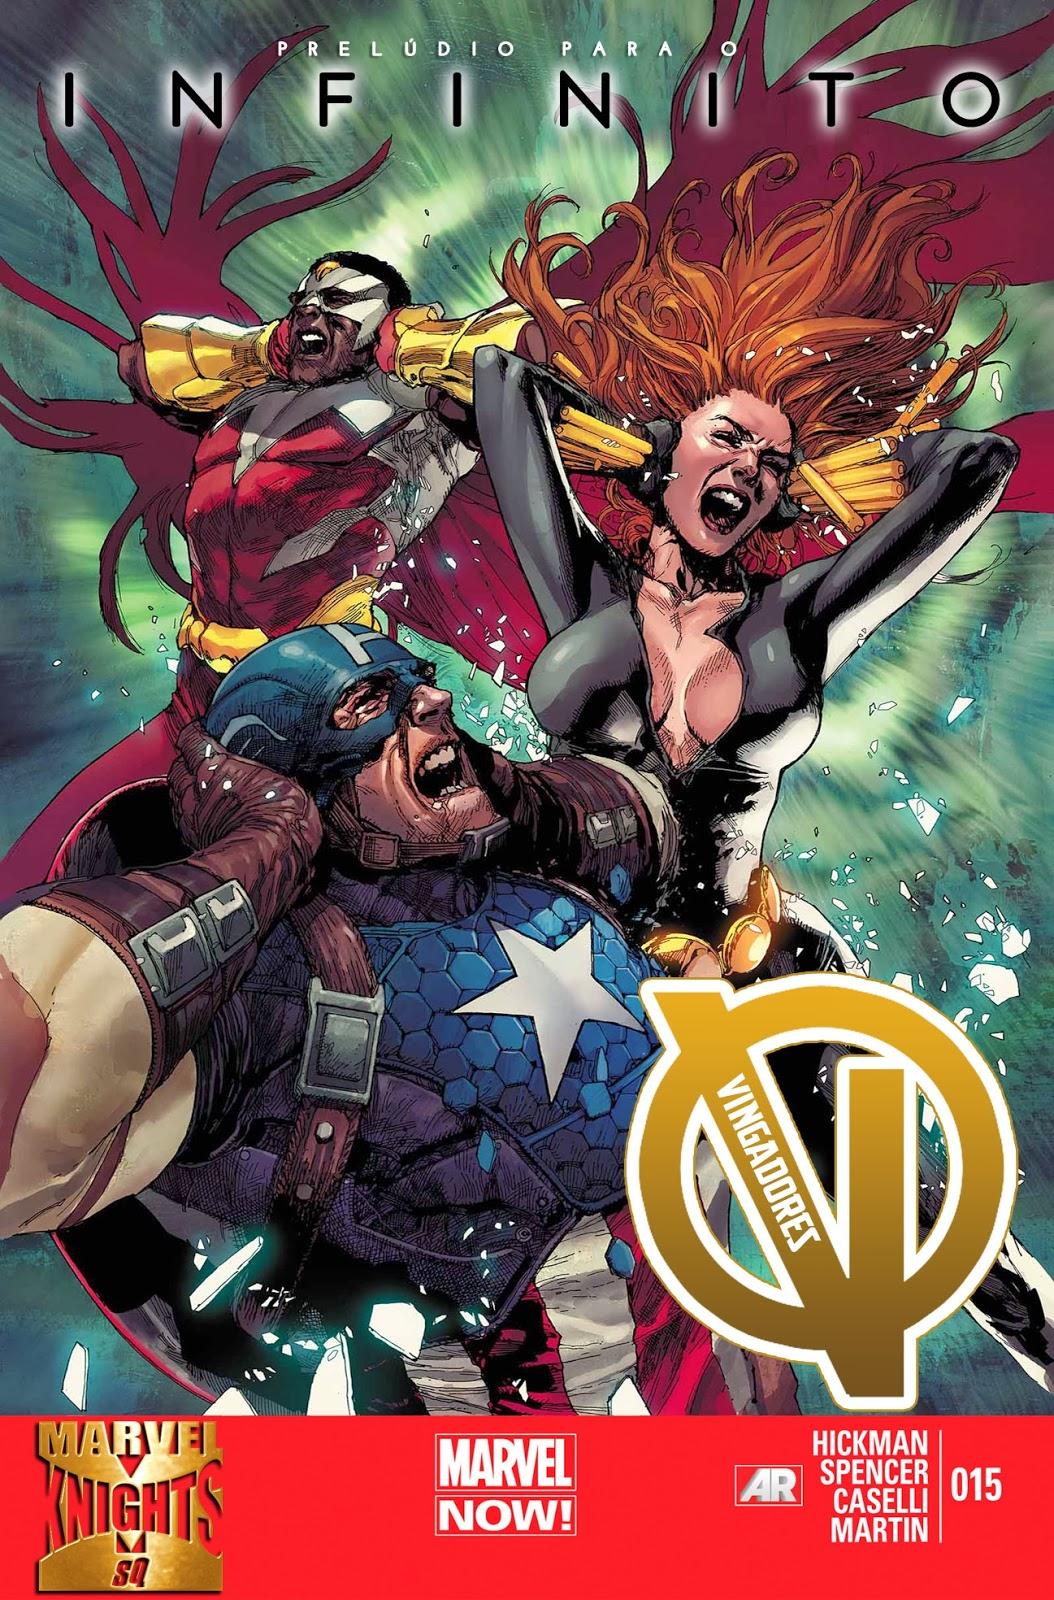 Nova Marvel! Vingadores #15